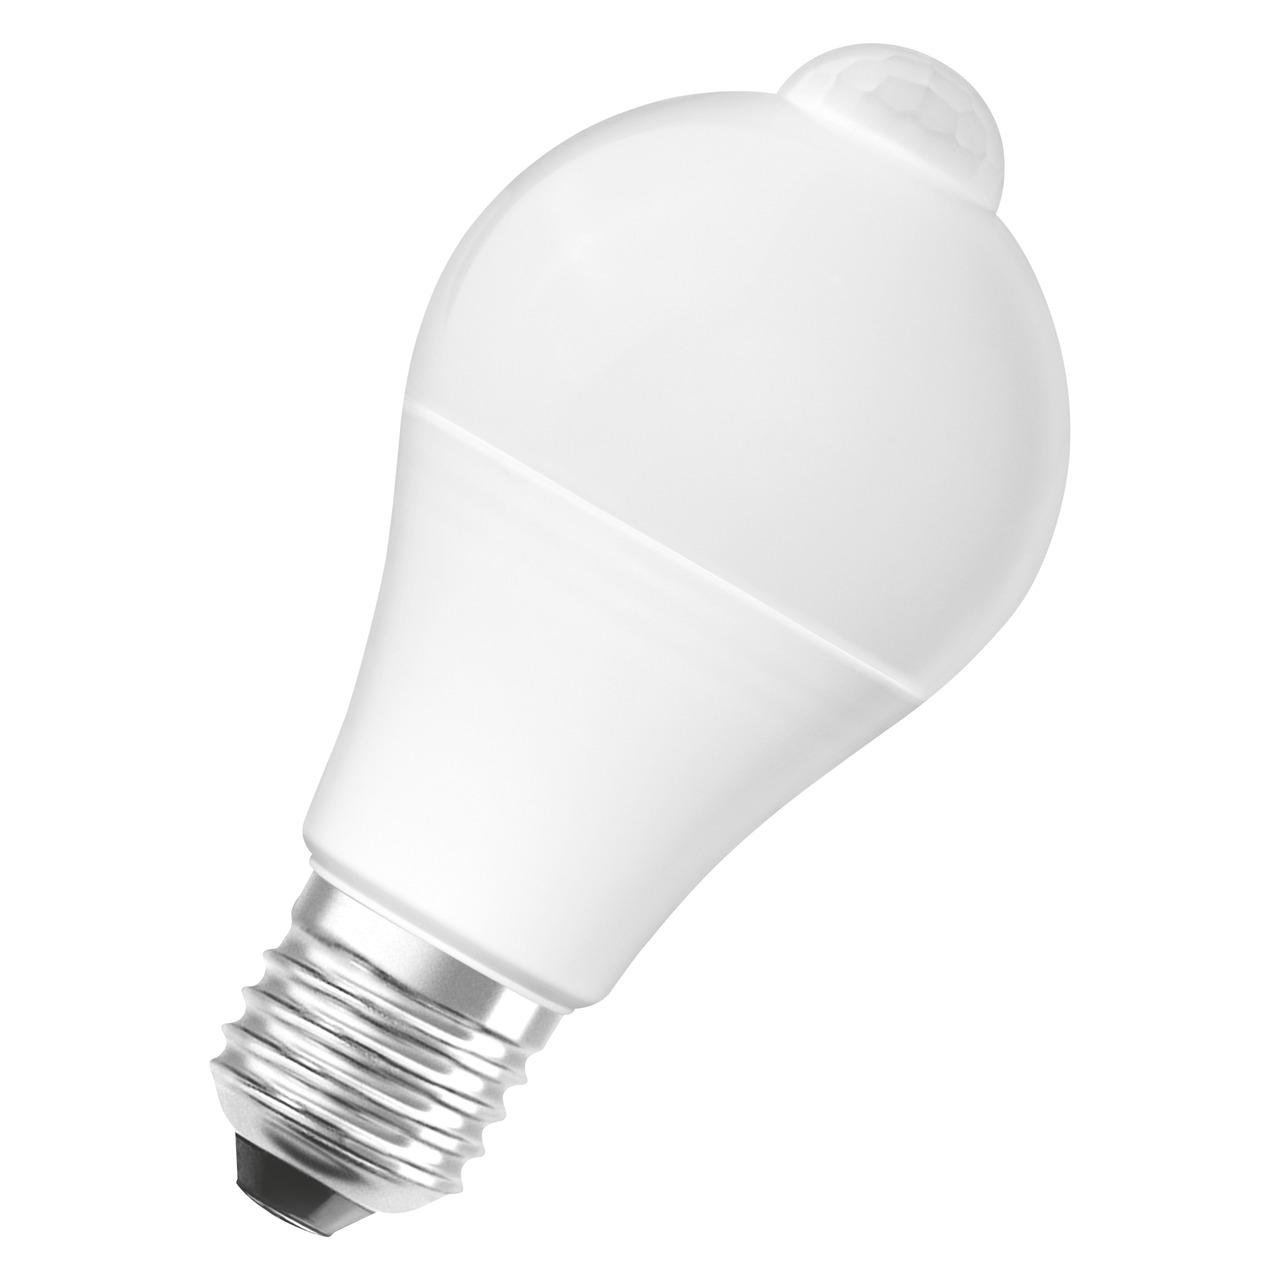 OSRAM LED STAR PLUS MOTION 9-W-Sensor-LED-Lampe E27 mit PIR-Bewegungsmelder- warmweiss